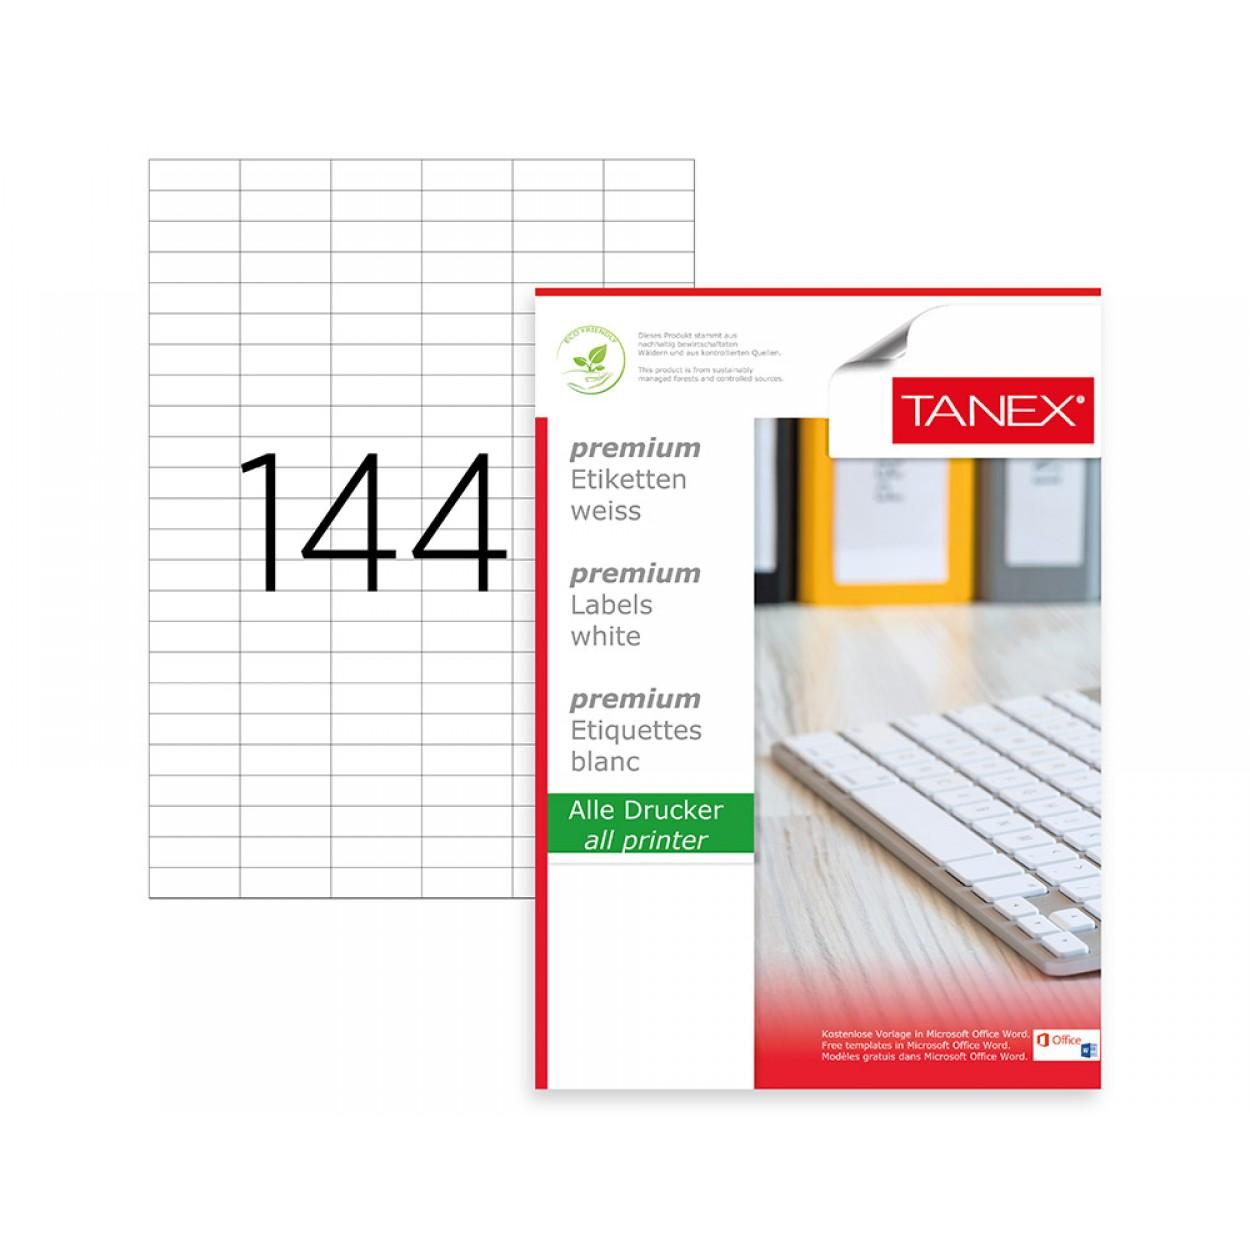 Tanex TW-2544 35x12.4355mm Kuşe Lazer Etiket 100 Lü Paket